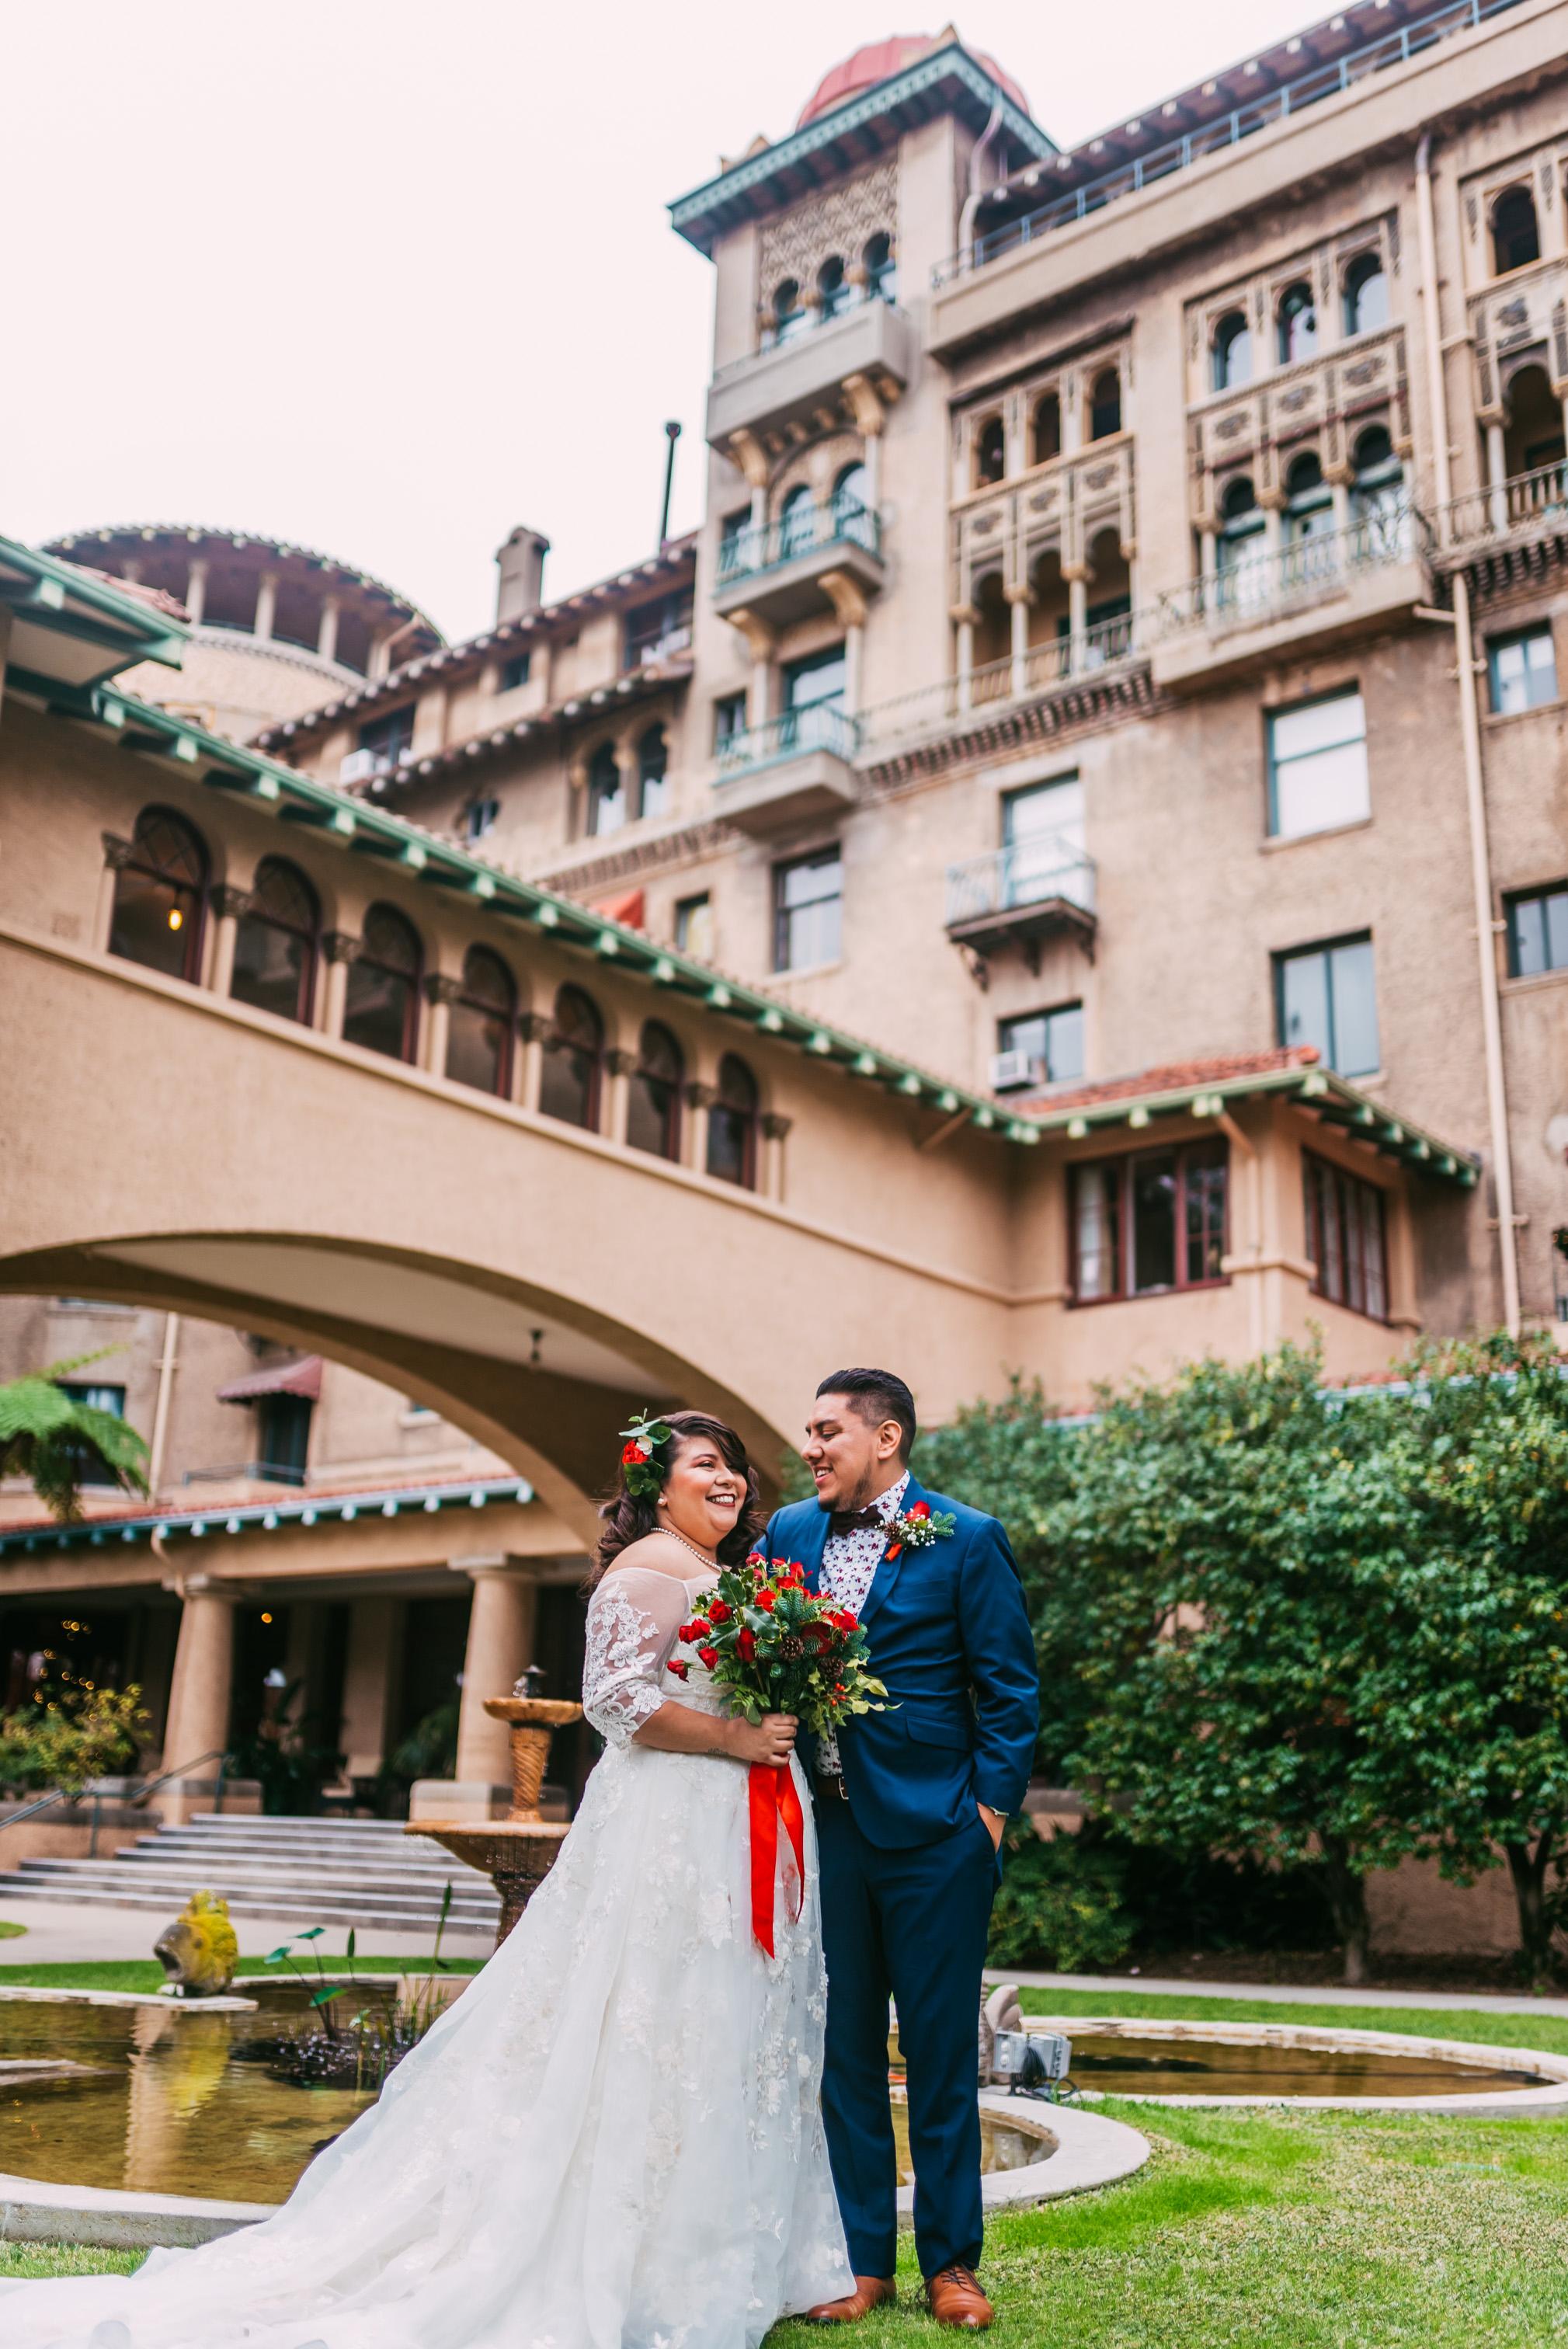 natalie-wedding-green-castle-pasadena-disney-theme-1-235.jpg